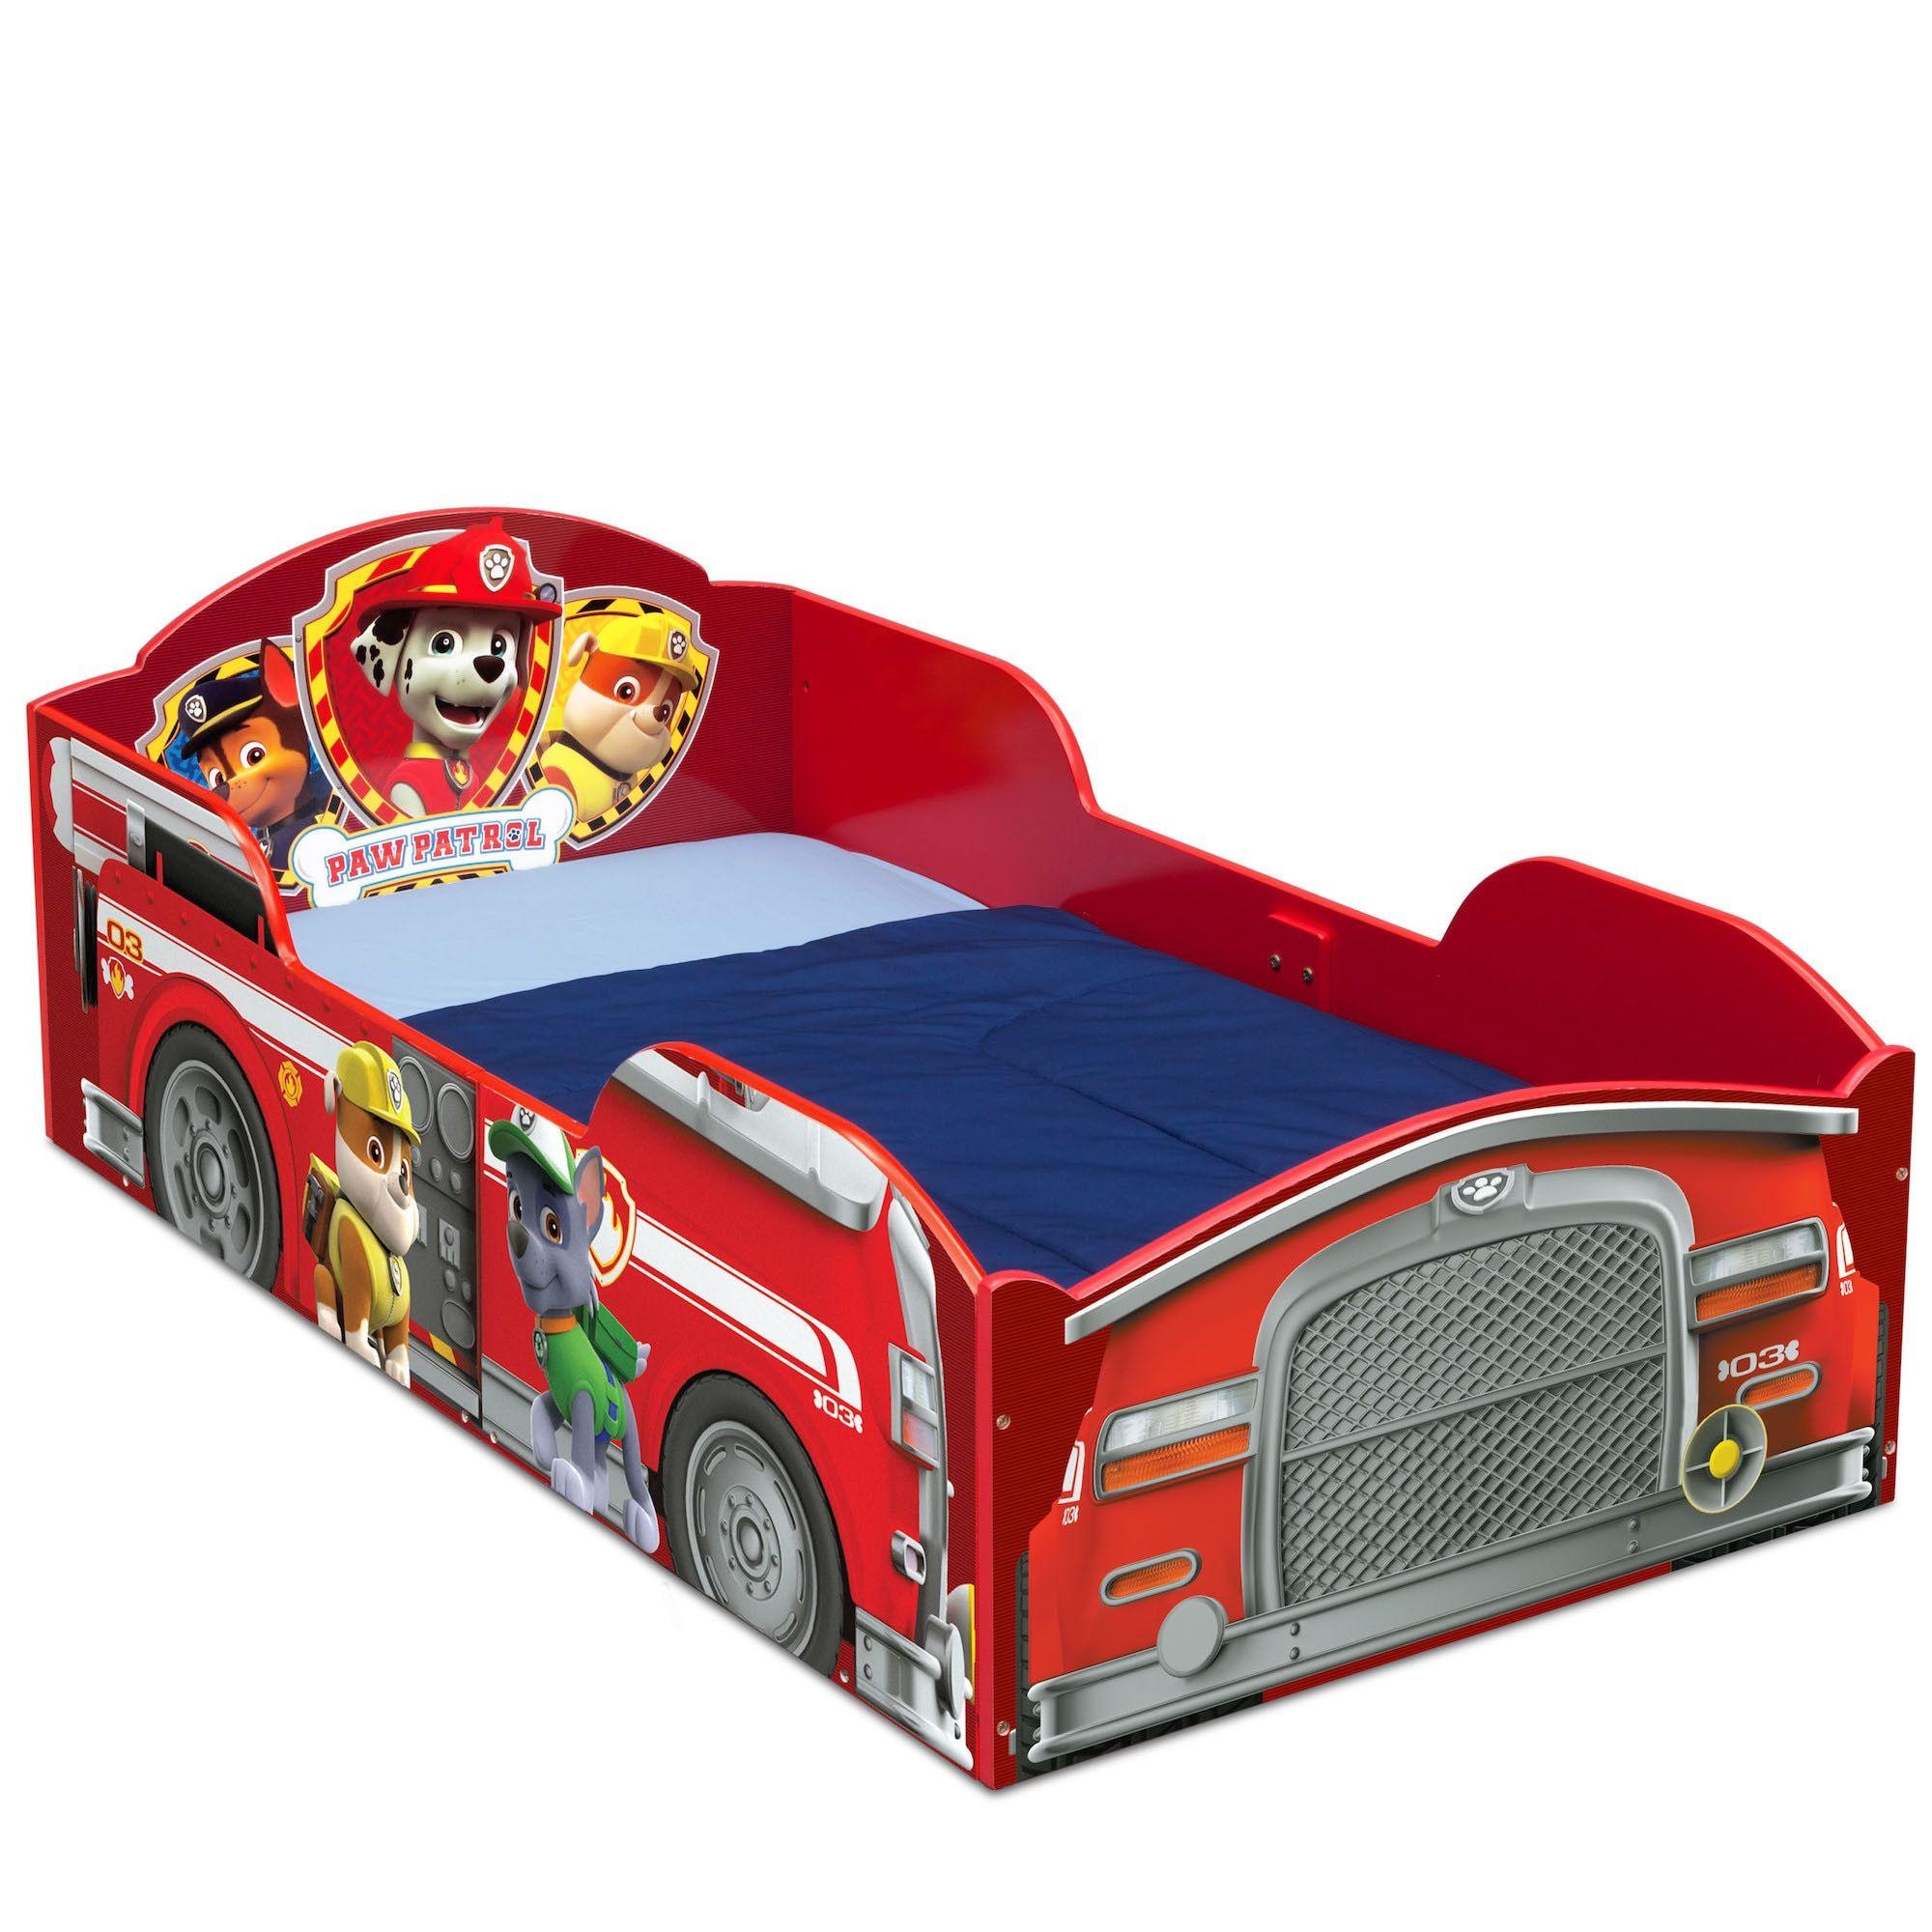 Delta Children Nick Jr PAW Patrol Wood Toddler Bed Red